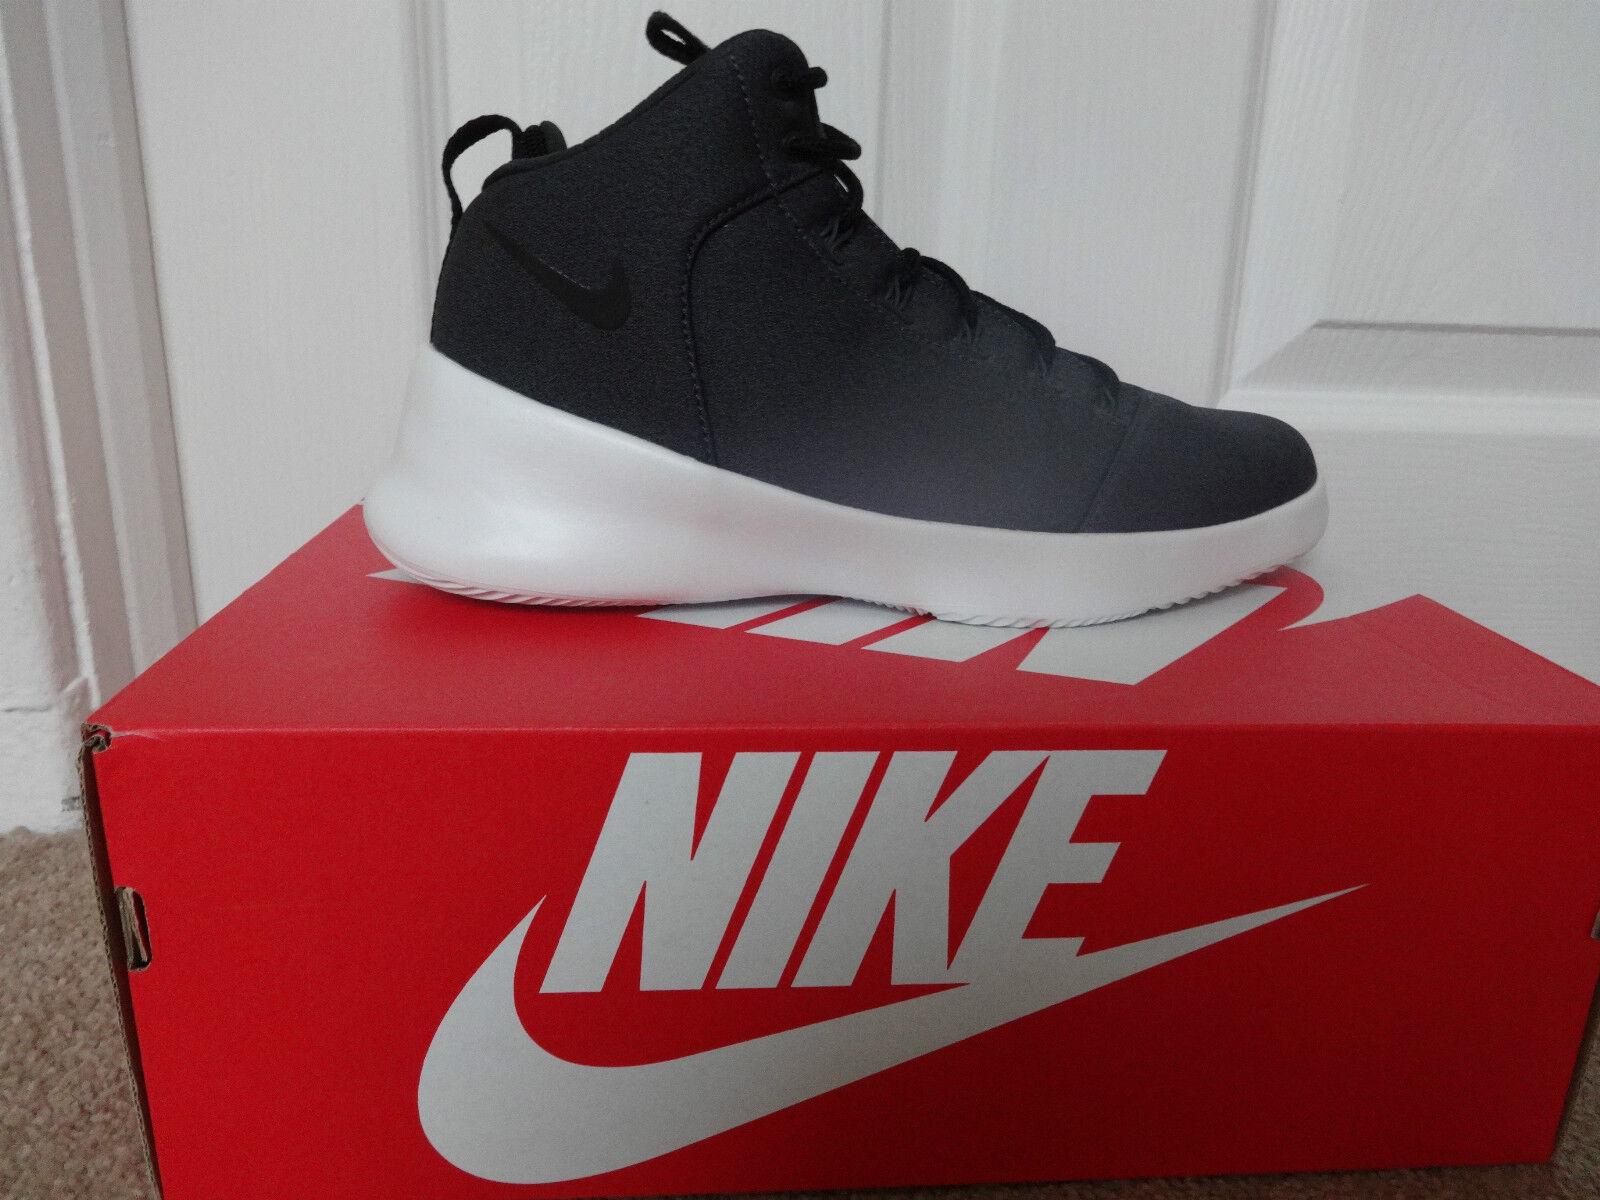 Nike Hyperfr3sh mens hi 003 top trainers Turnschuhe schuhe 759996 003 hi NEW+BOX 0d5cec